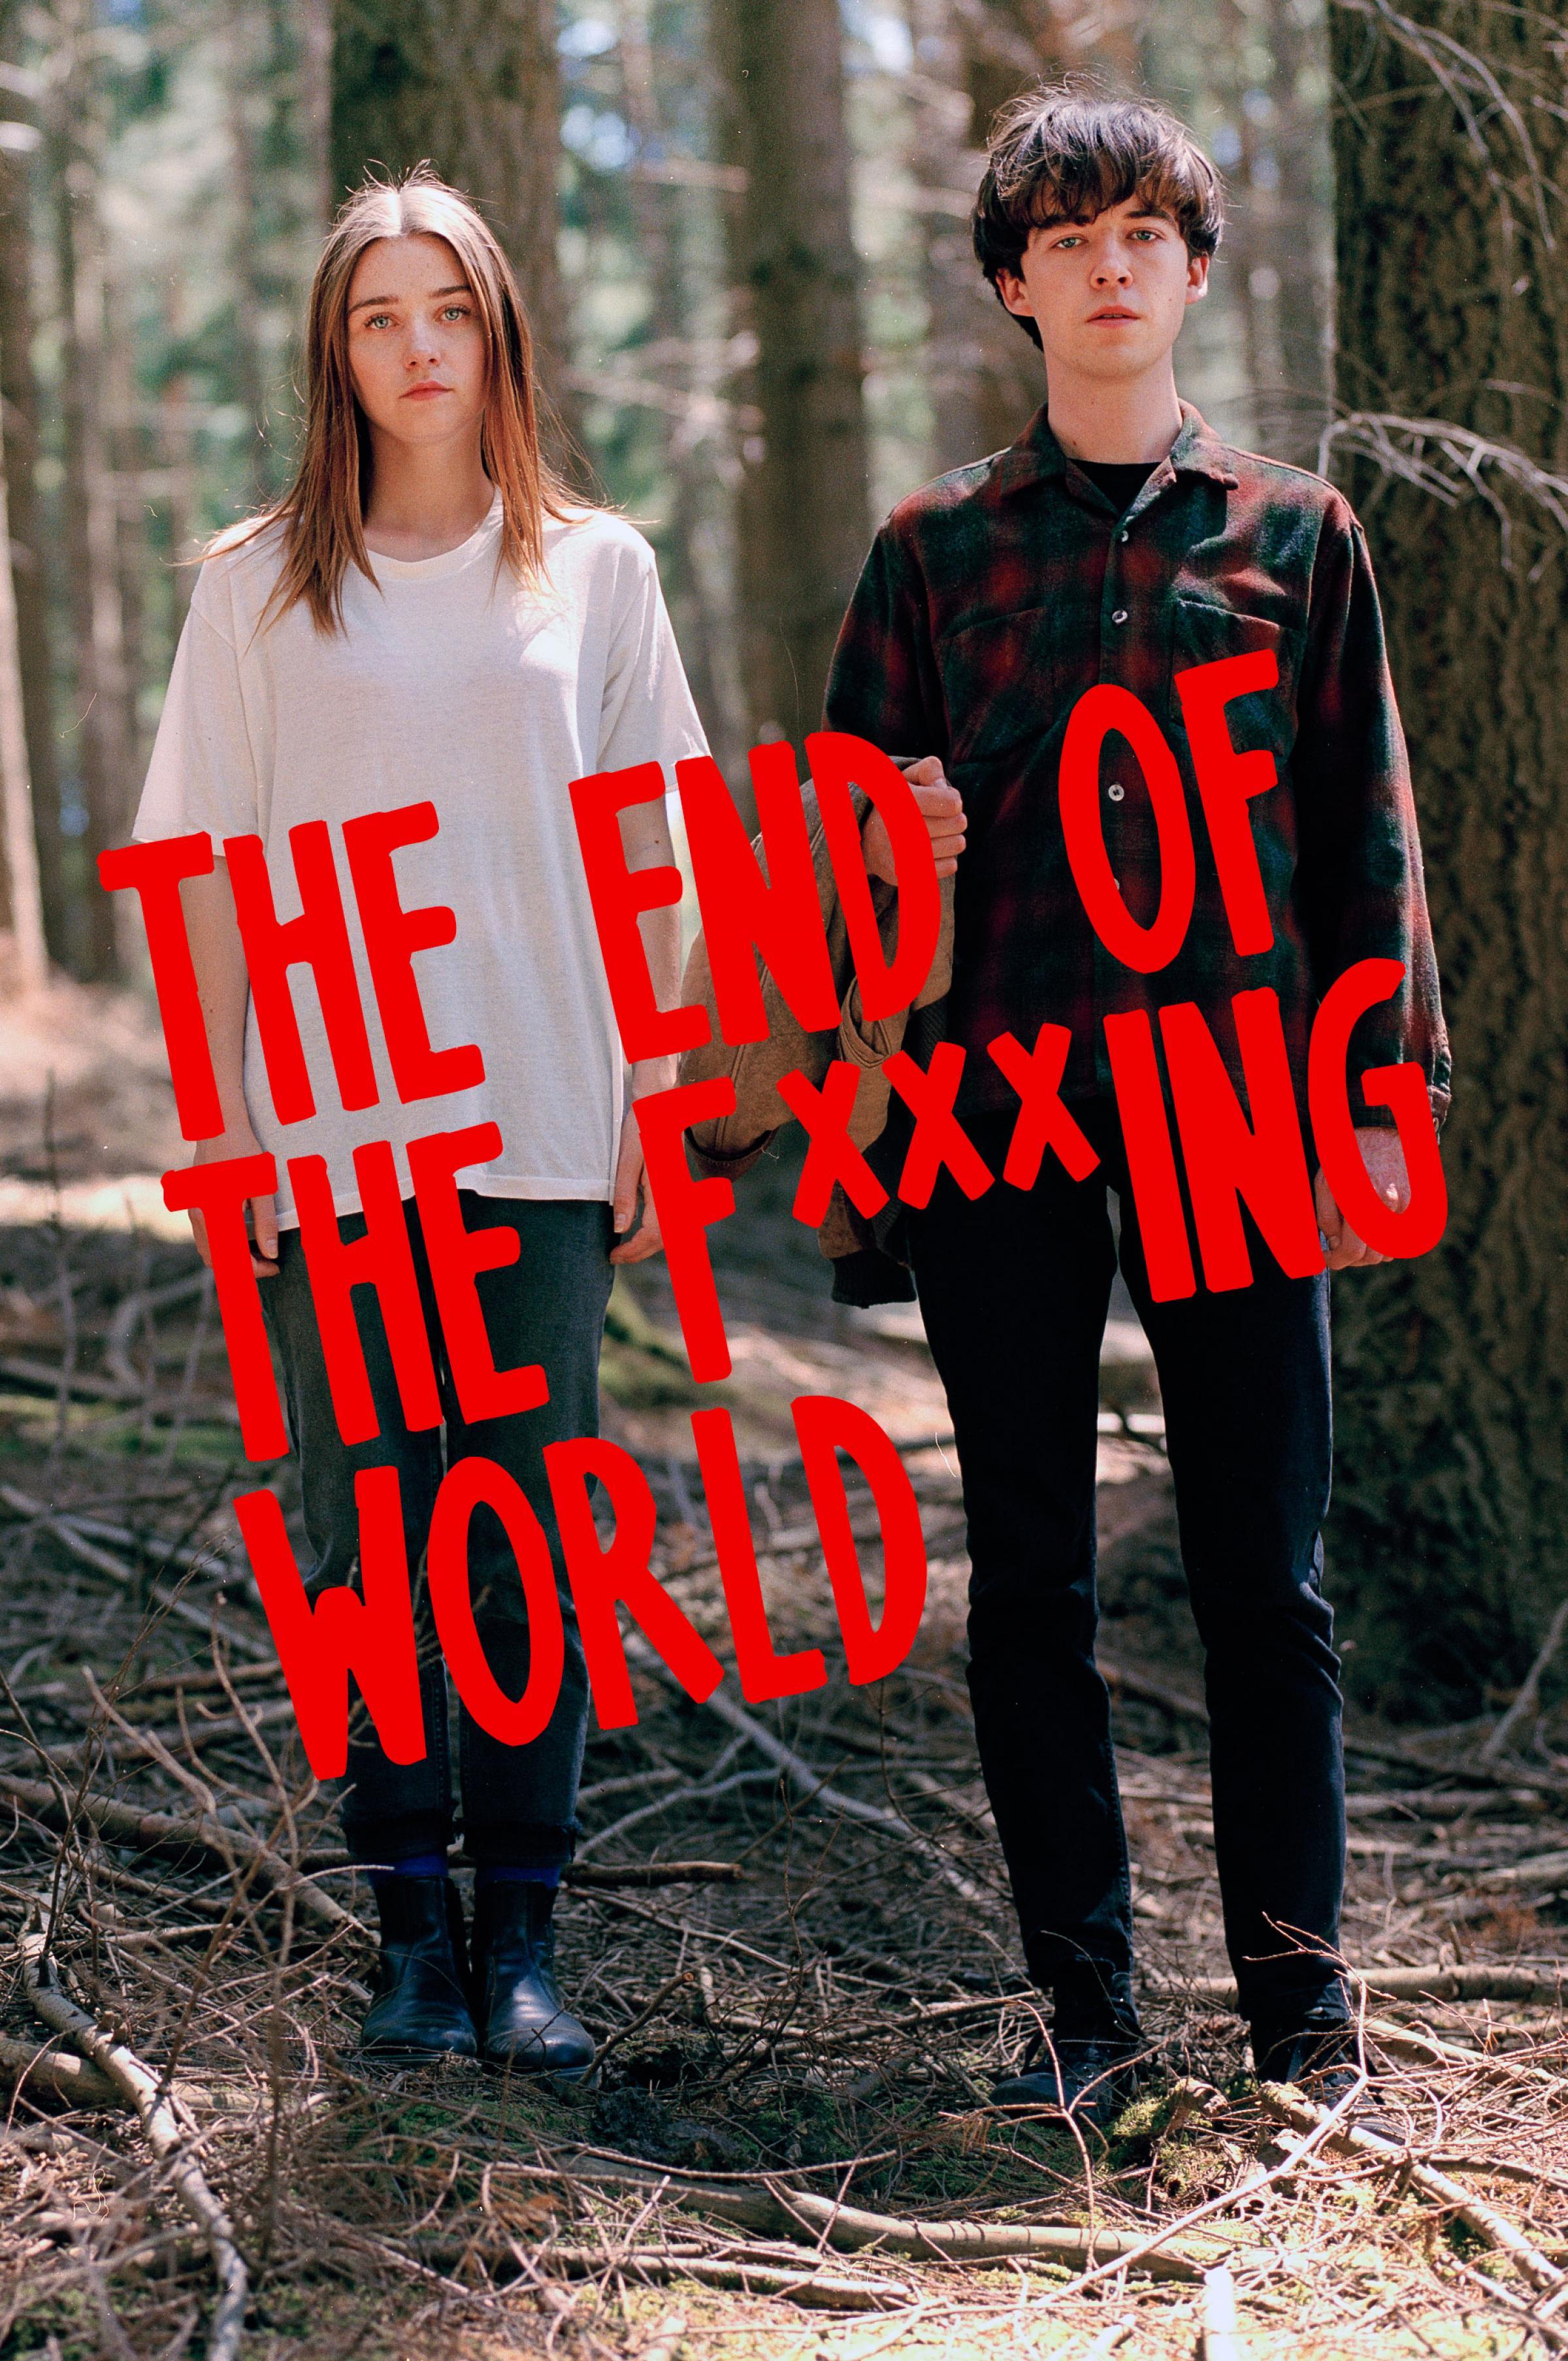 fxxxing-world.jpg